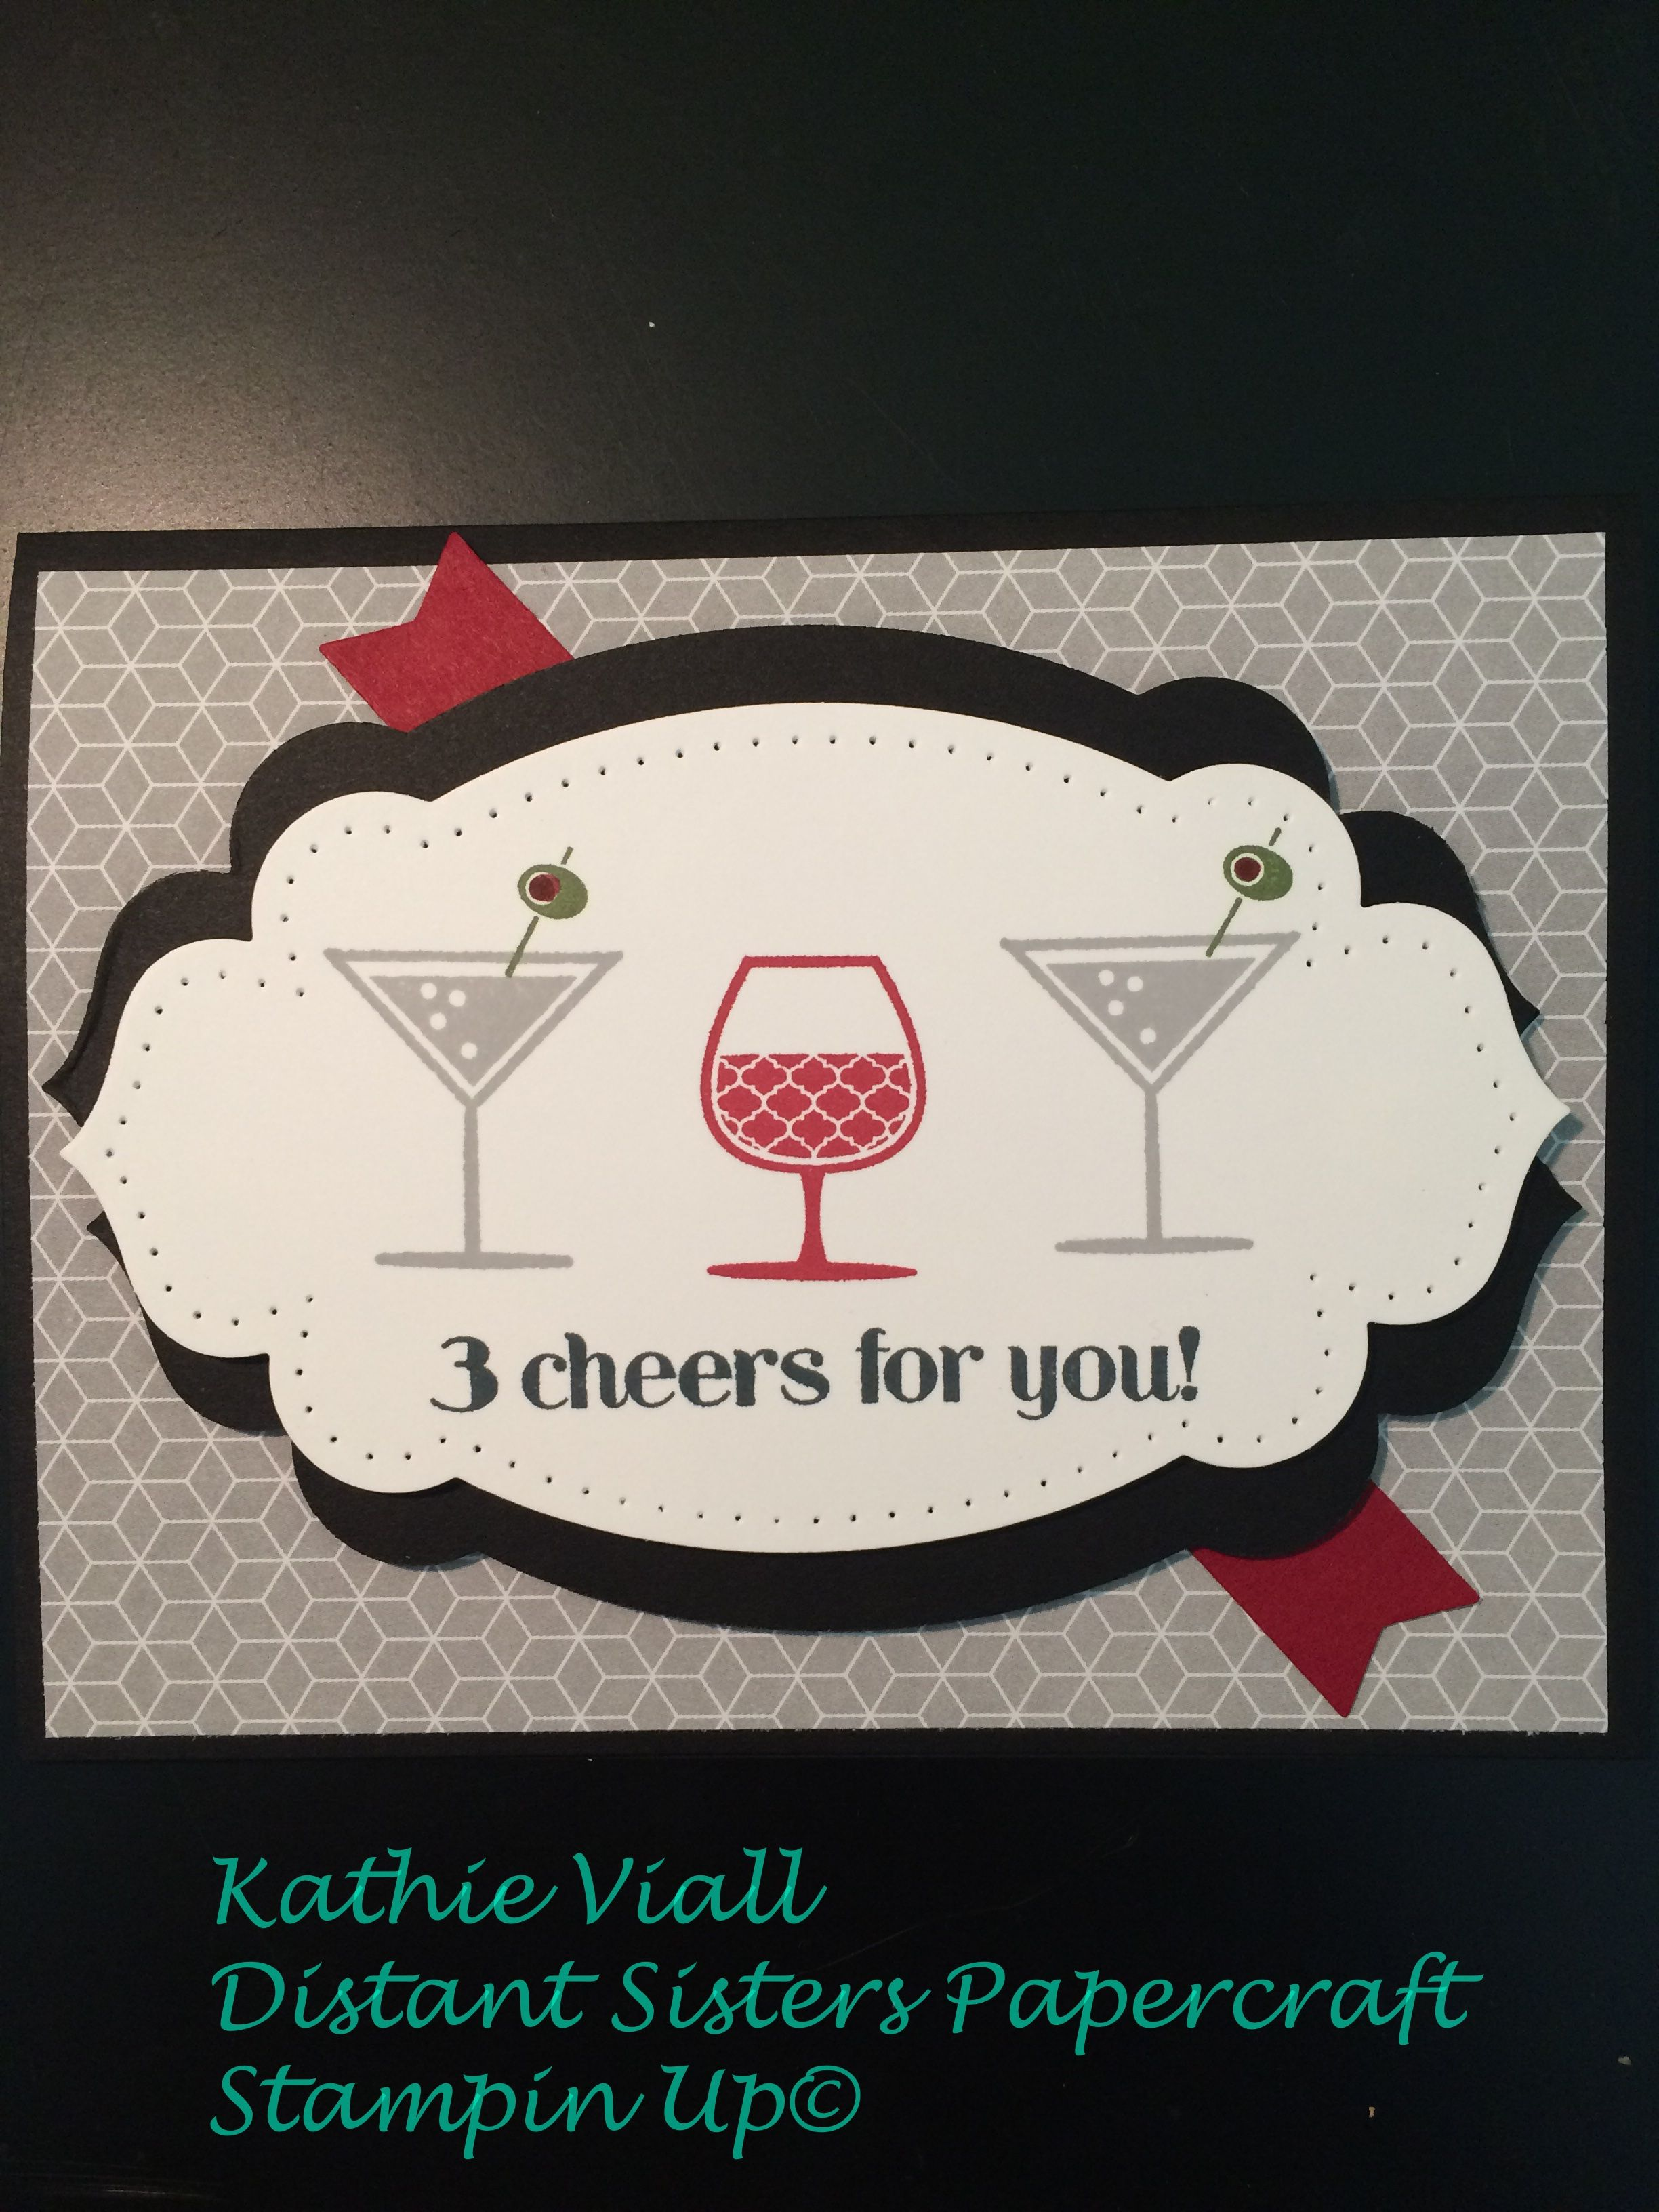 3 cheers